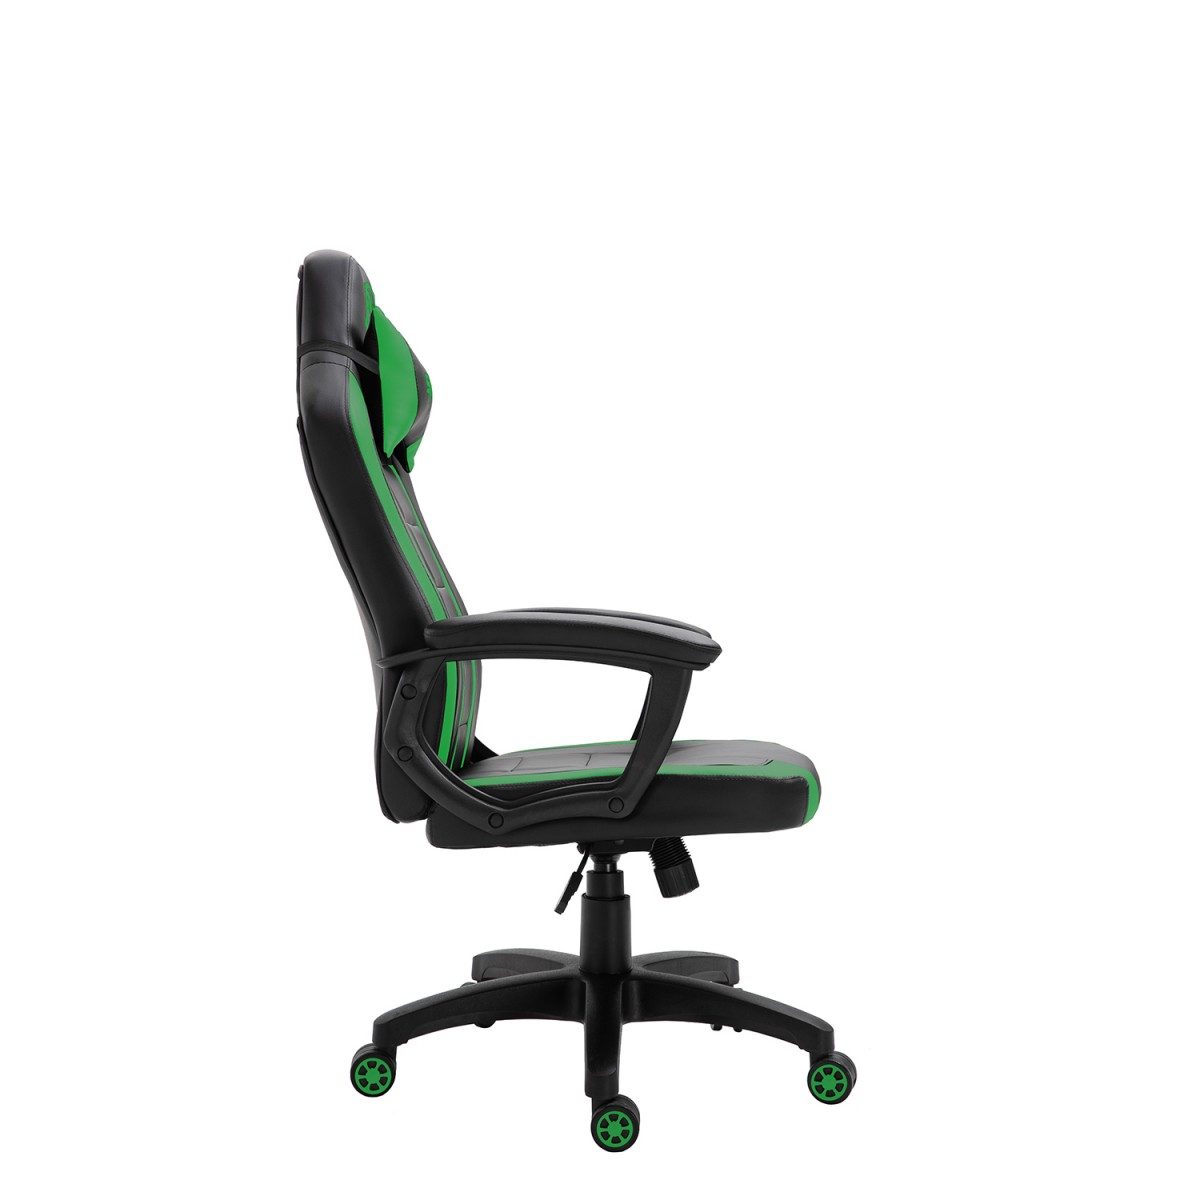 Cadeira Gamer Snake Viper II, Black/Green, SNG-CH-VI002